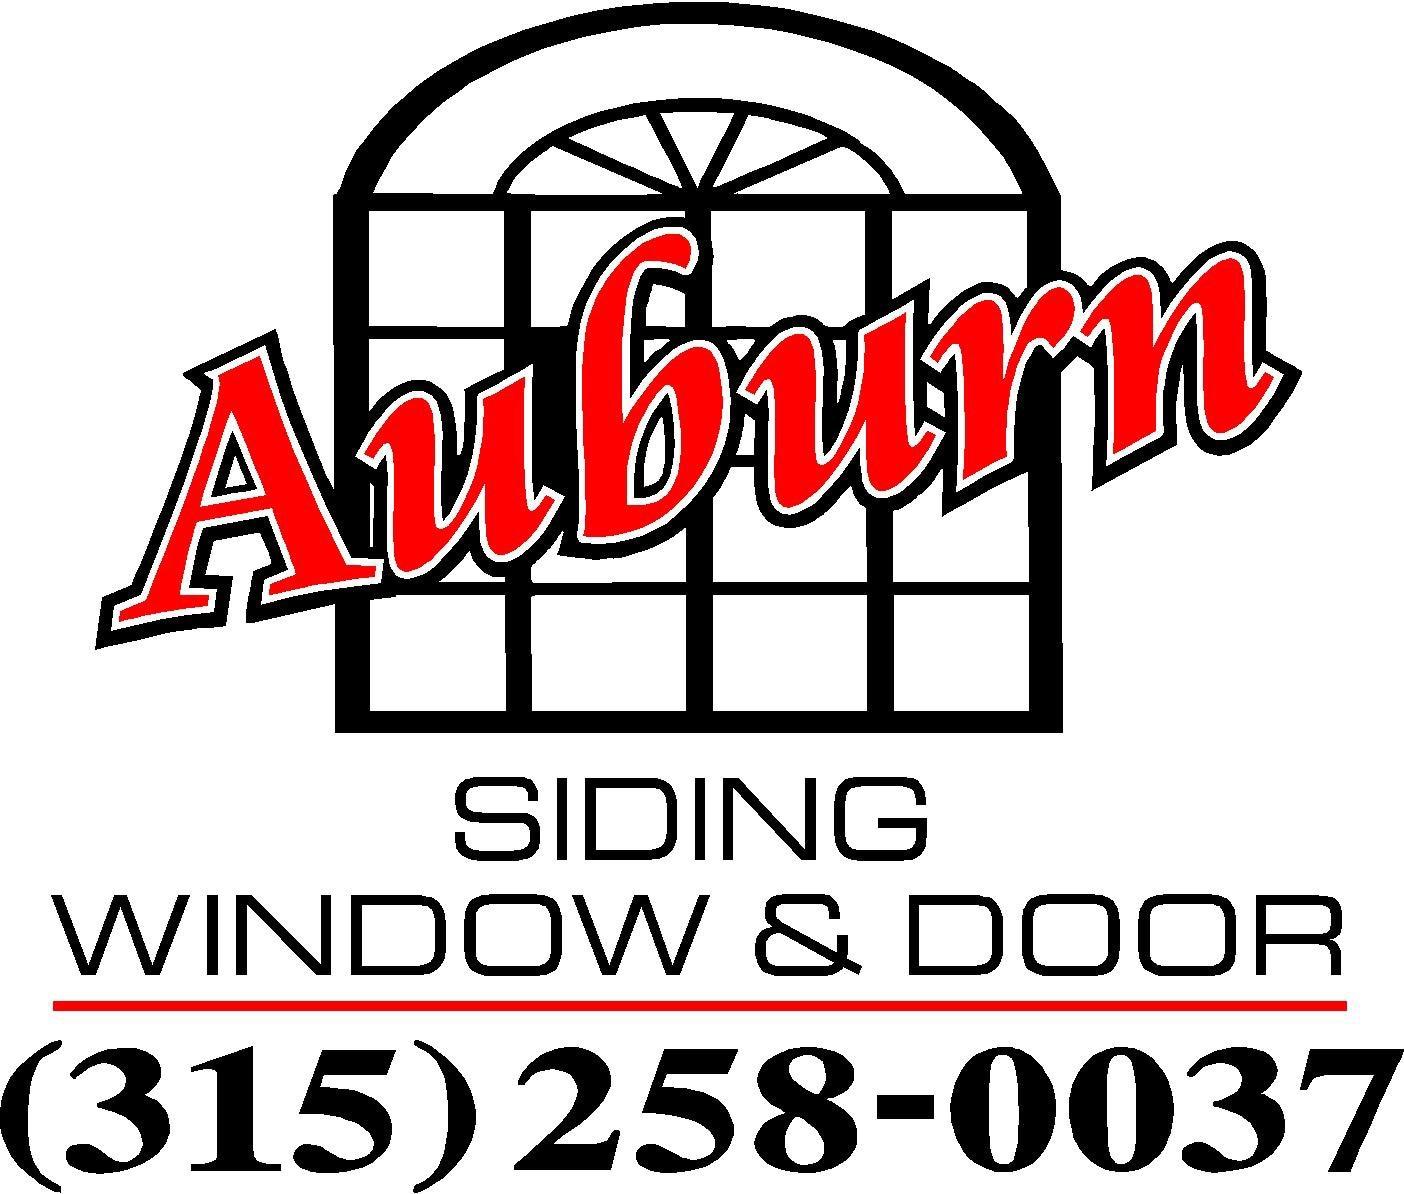 Auburn Siding Window & Door logo